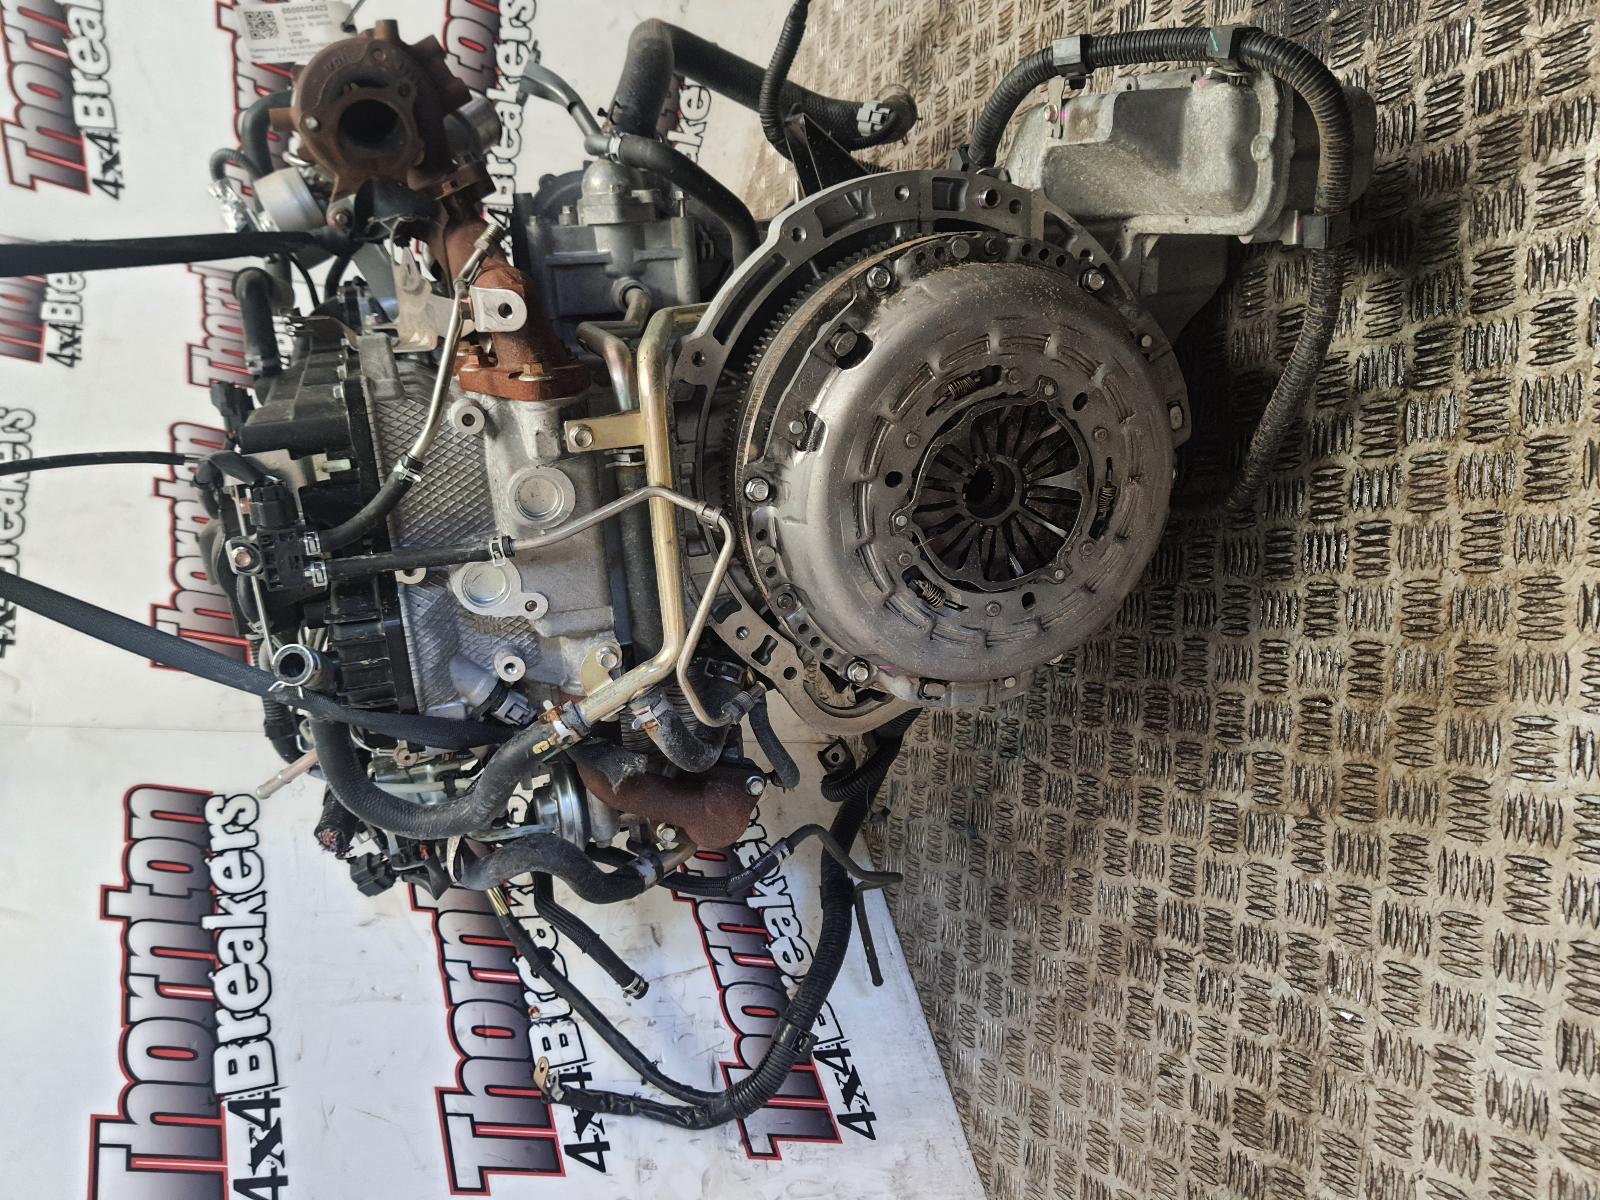 Image for a 2018 MITSUBISHI L200 2.4 Diesel 4N15 Engine